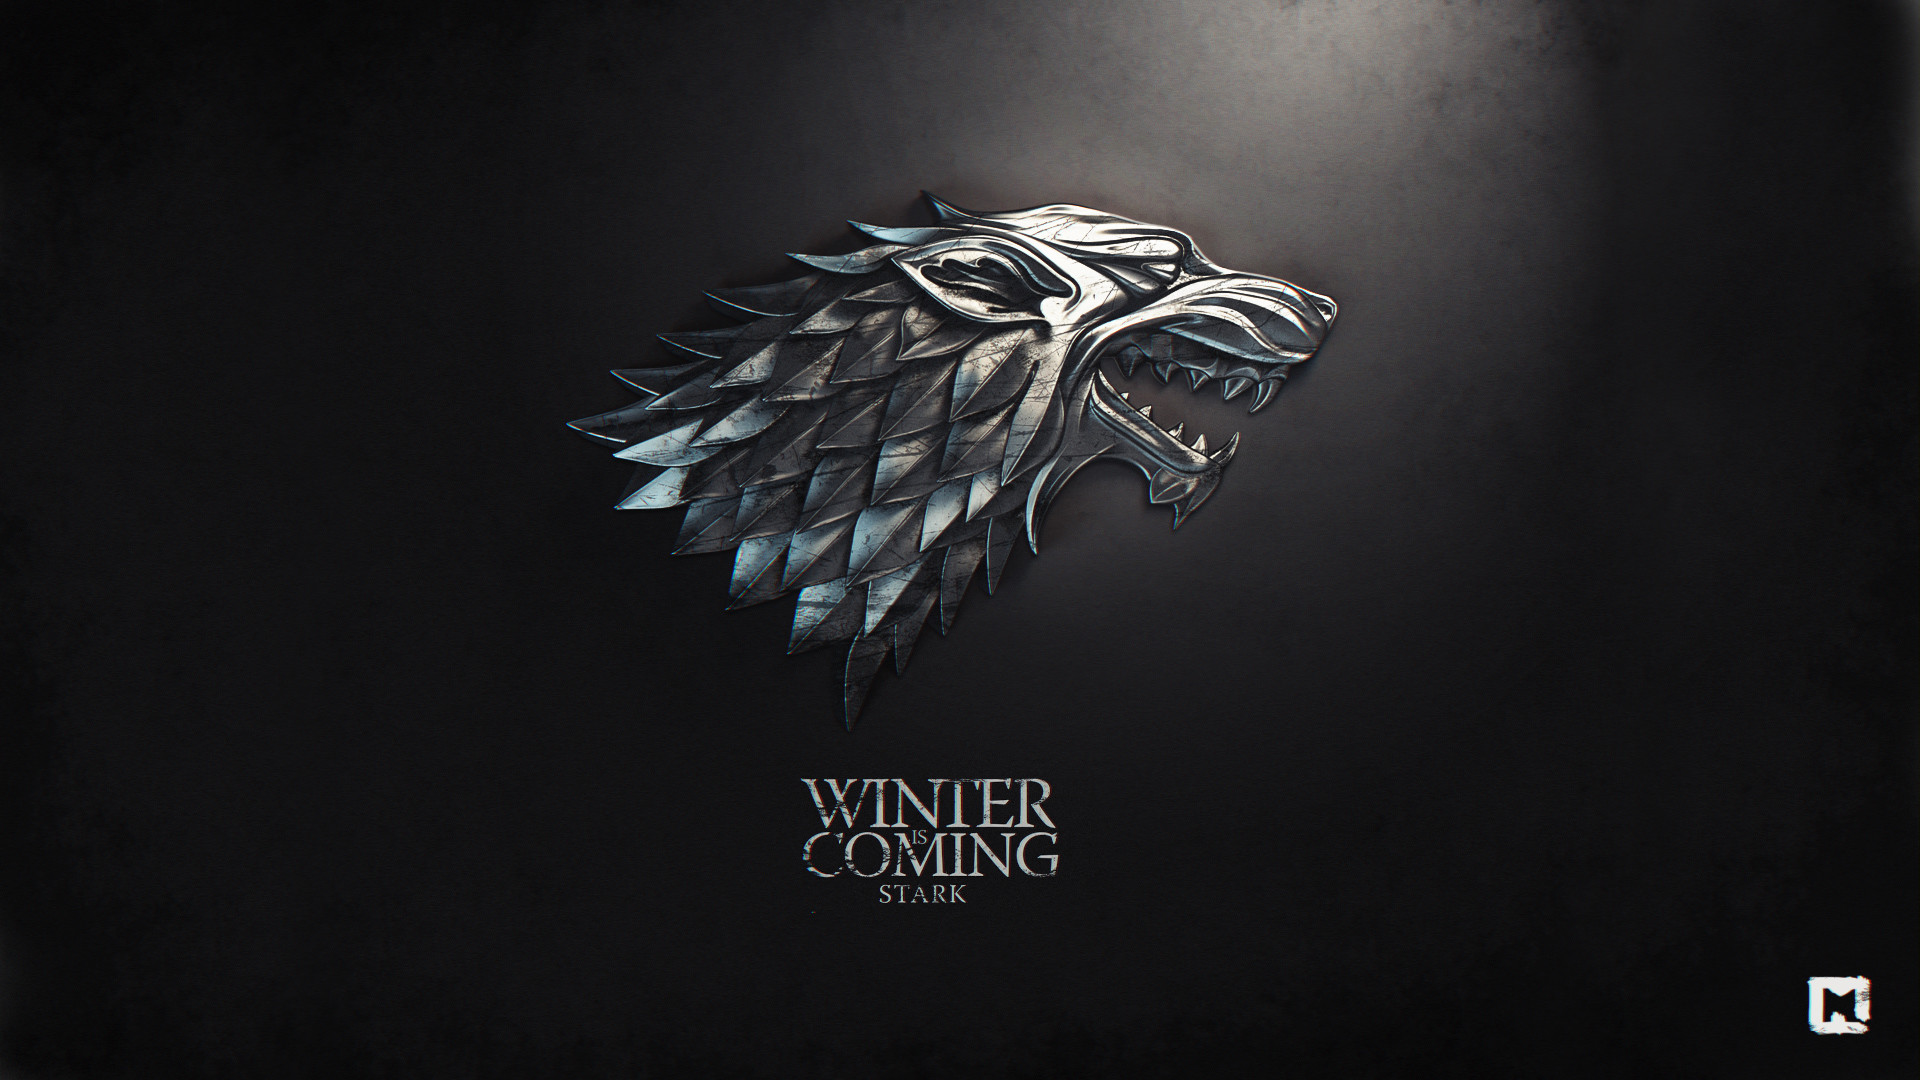 Stark, Targaryen …